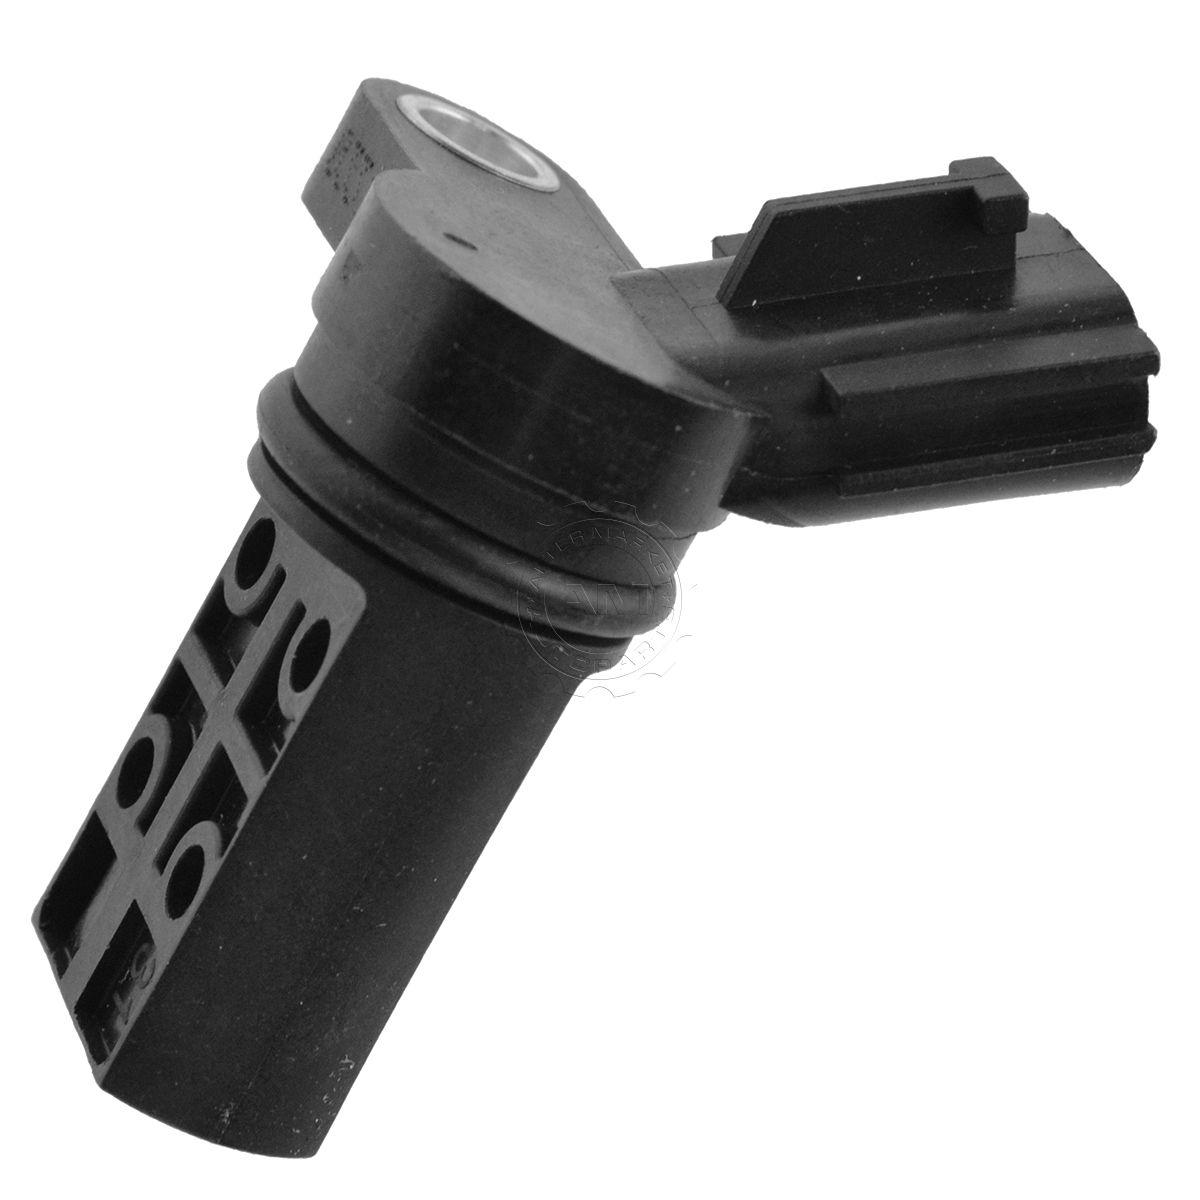 2000 Infiniti Q Camshaft: Crankshaft Camshaft Position Sensor For Nissan Infiniti 1